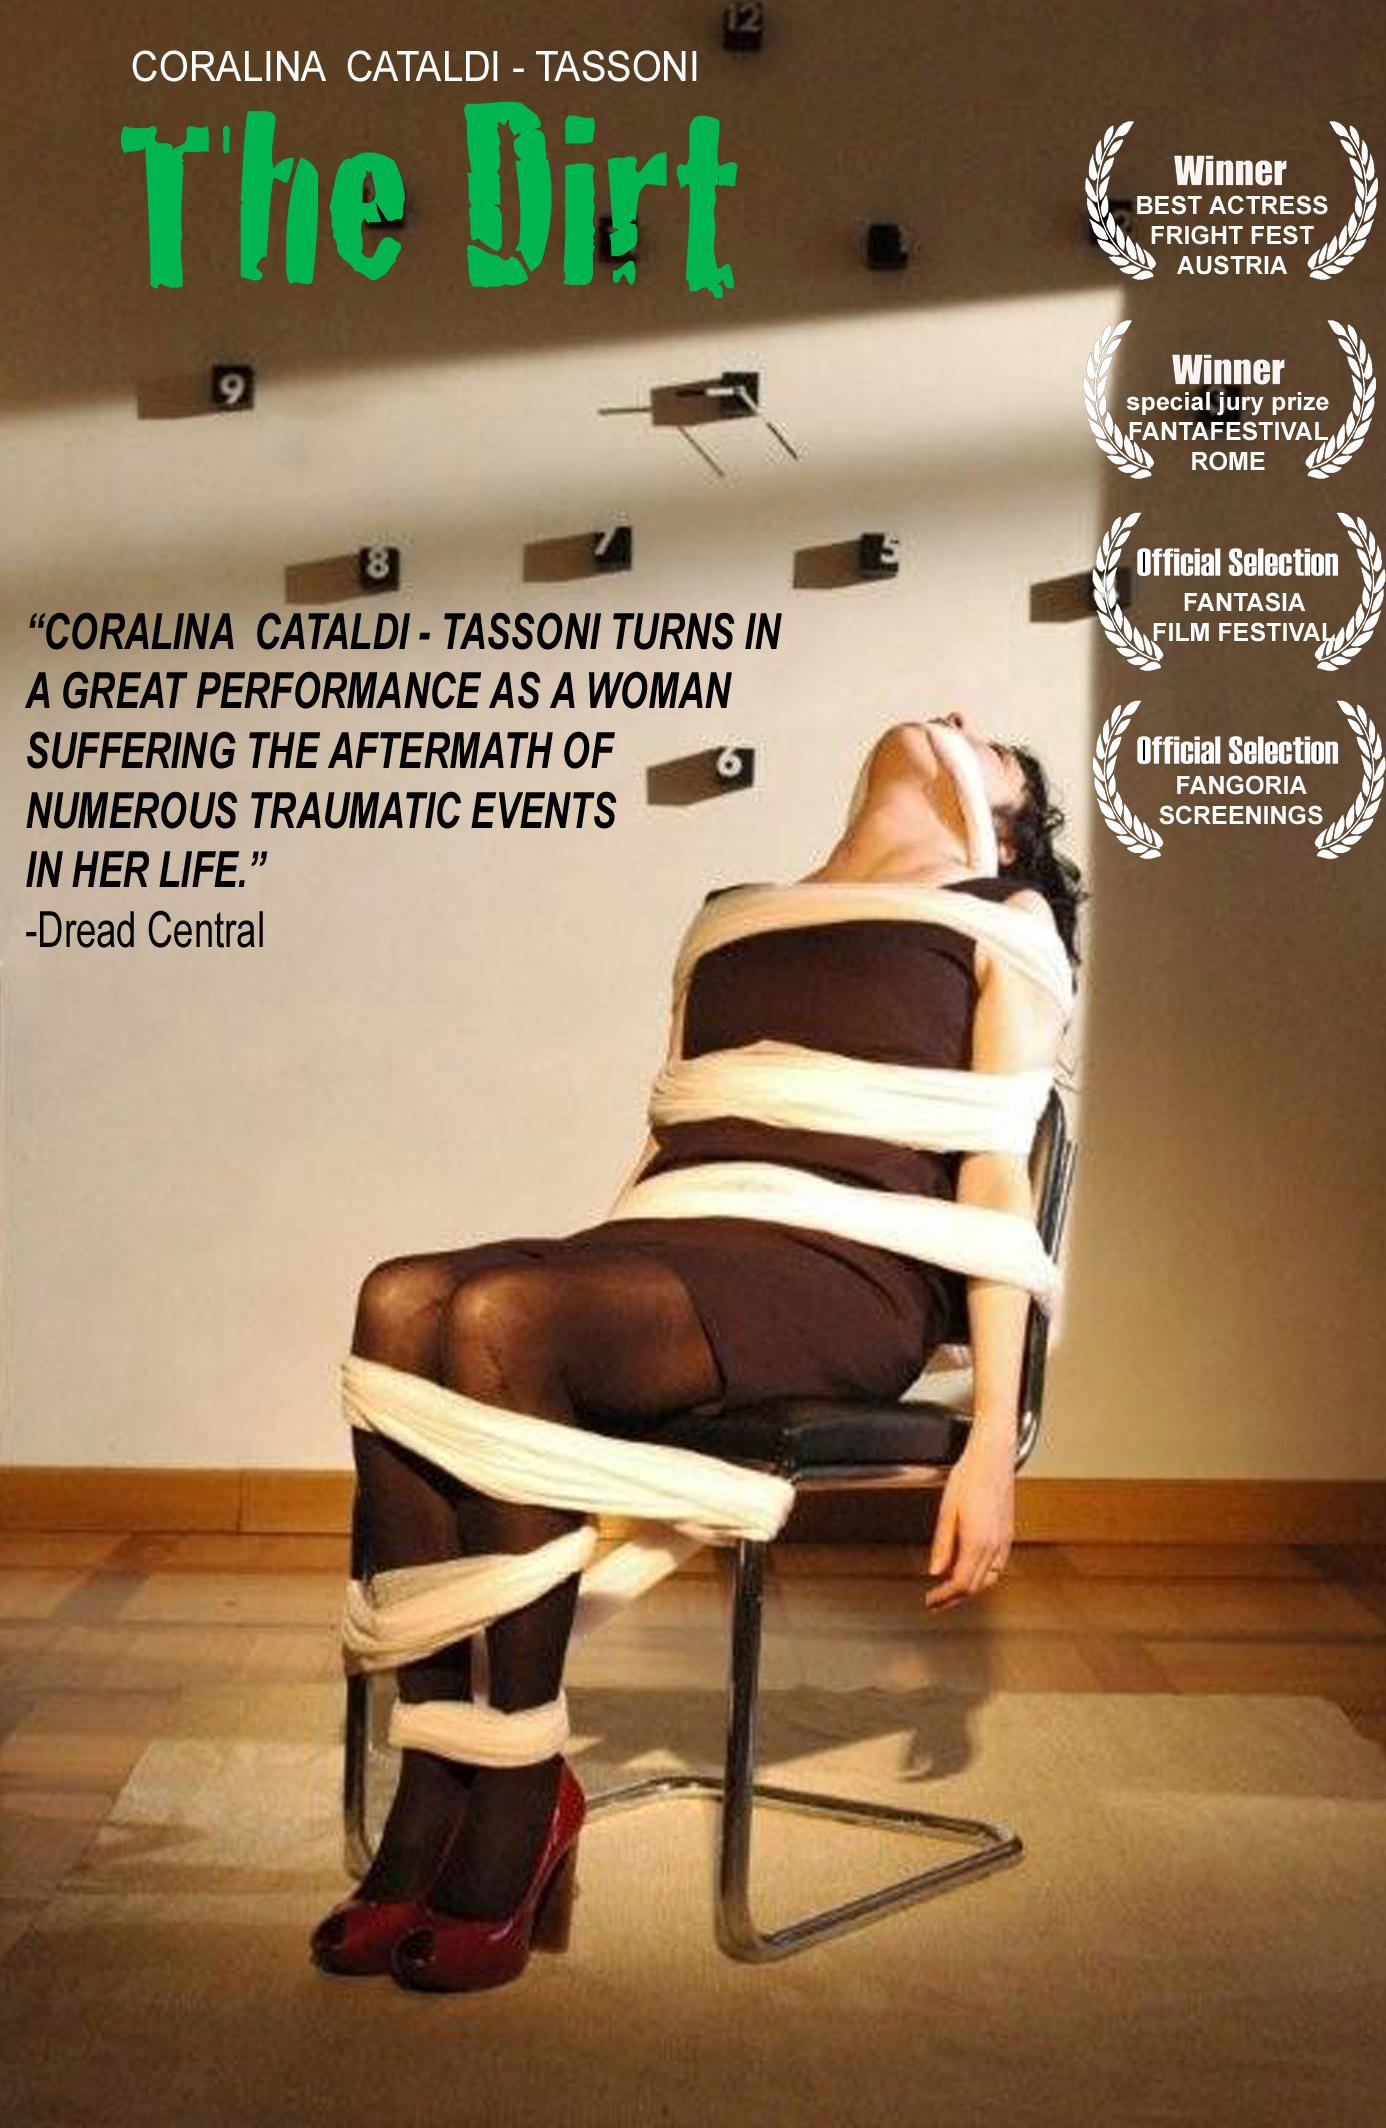 Coralina Cataldi-Tassoni in THE DIRT movie poster